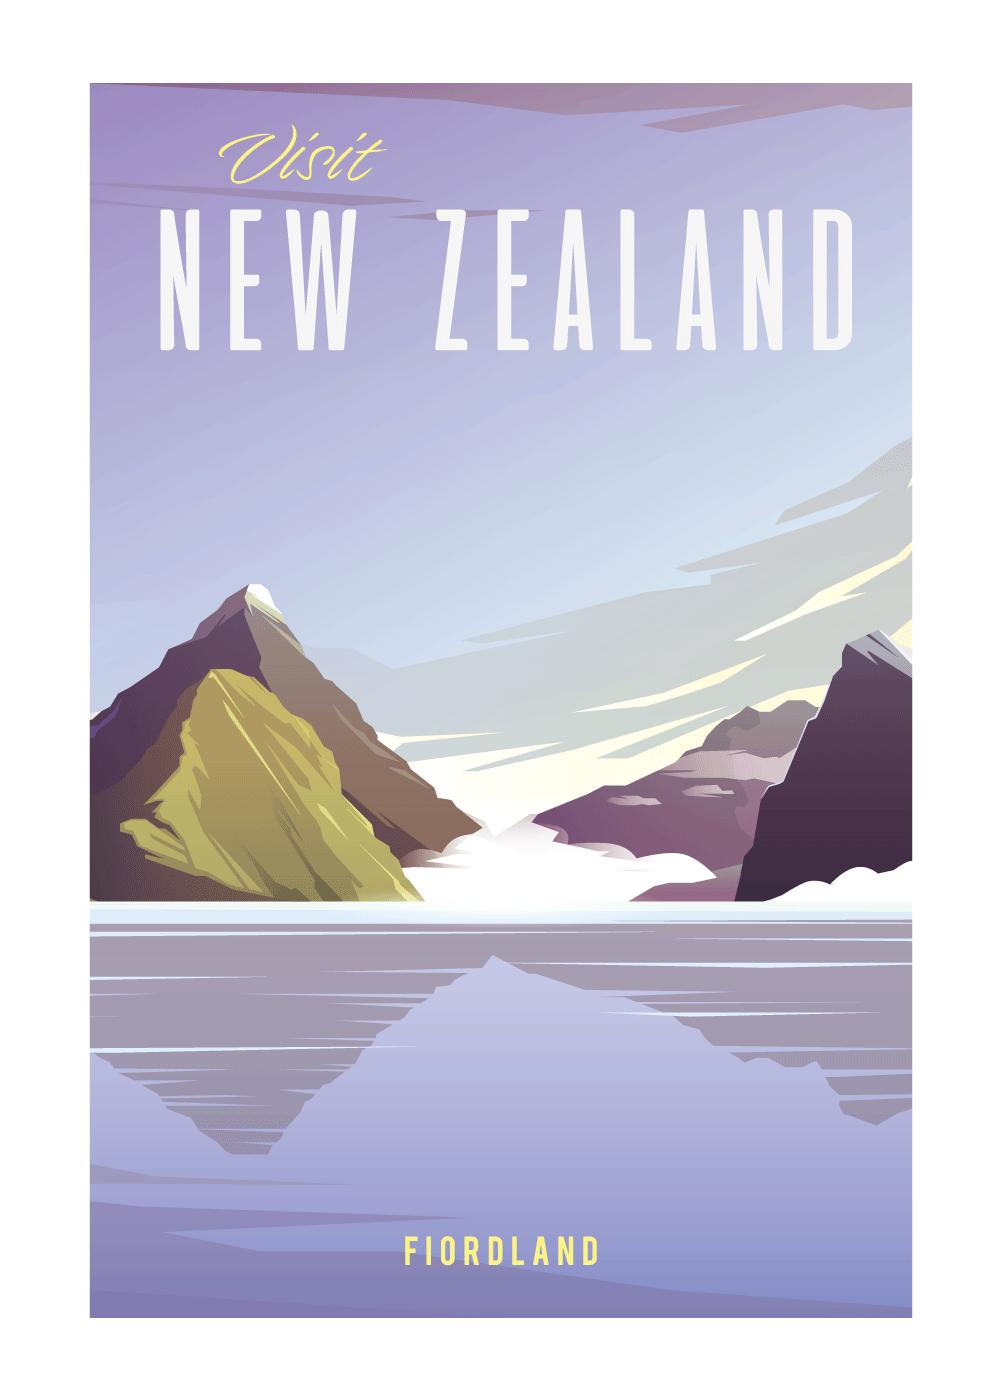 Visit New Zealand - rejse plakat